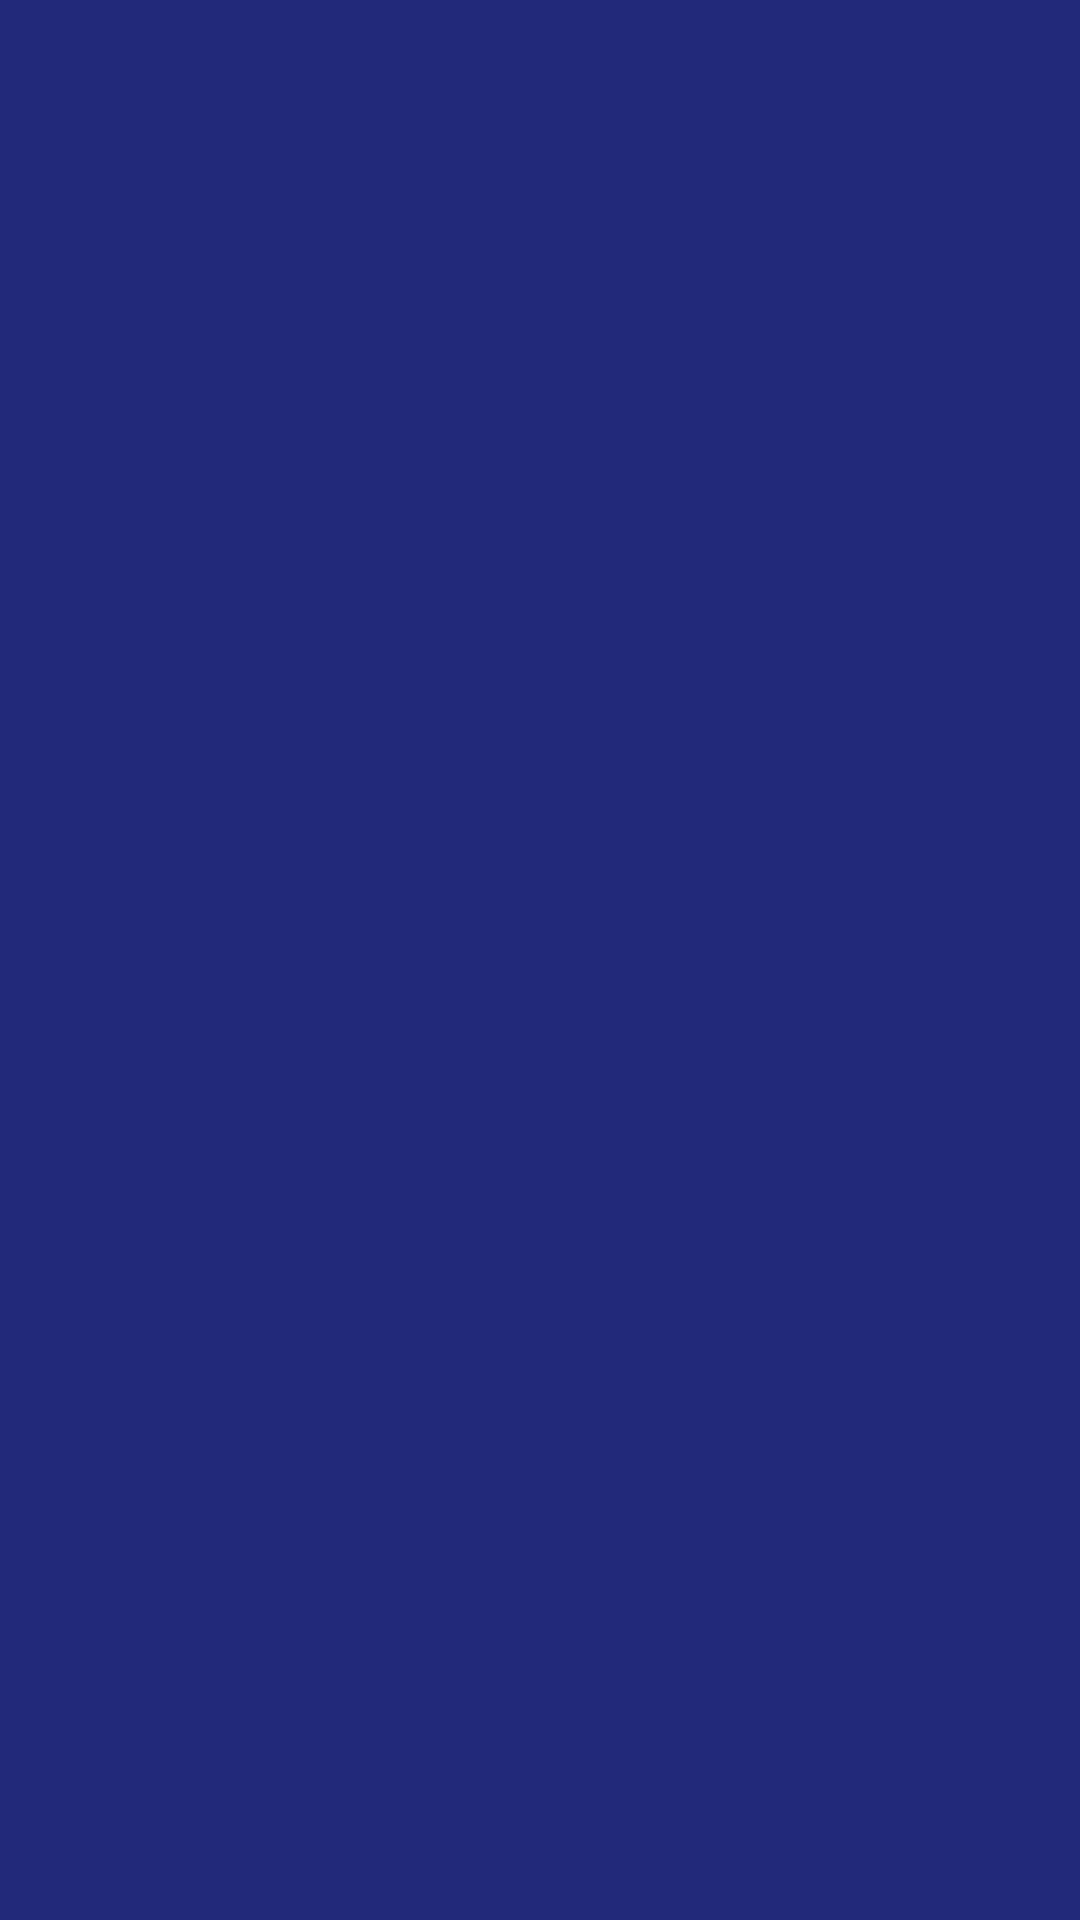 1080x1920 St Patricks Blue Solid Color Background